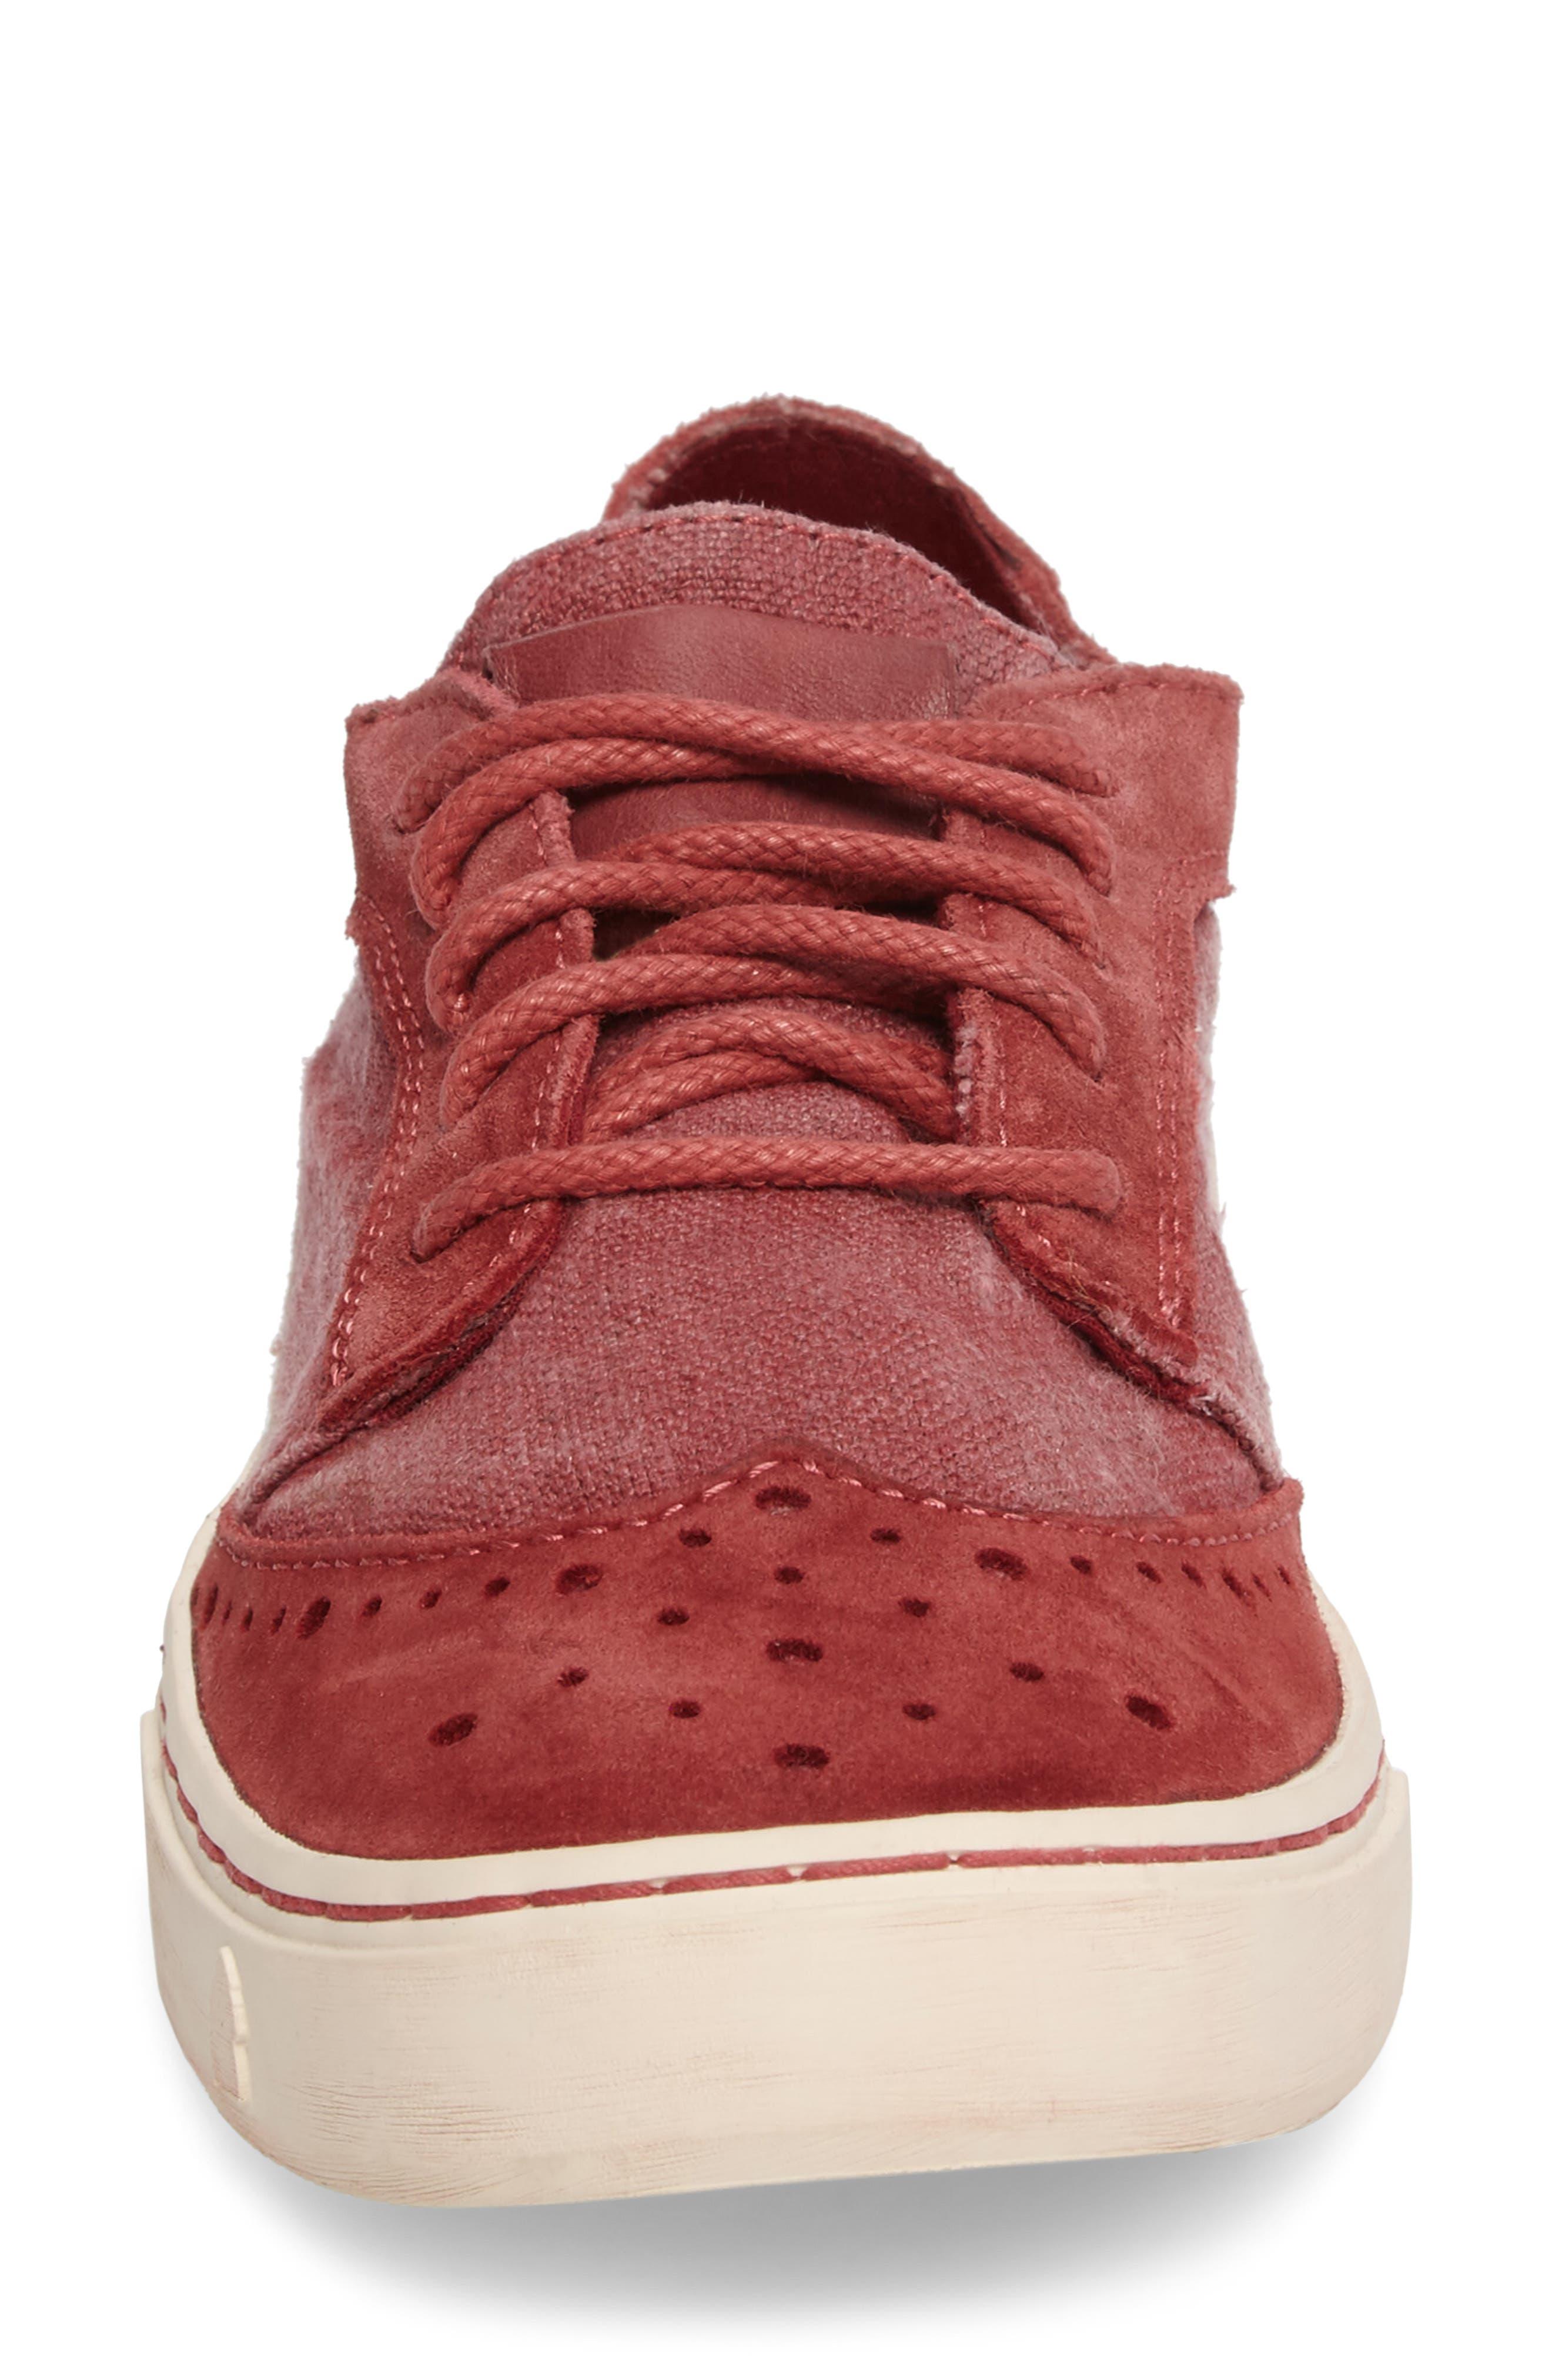 Yukai Sneaker,                             Alternate thumbnail 4, color,                             Sandalwood